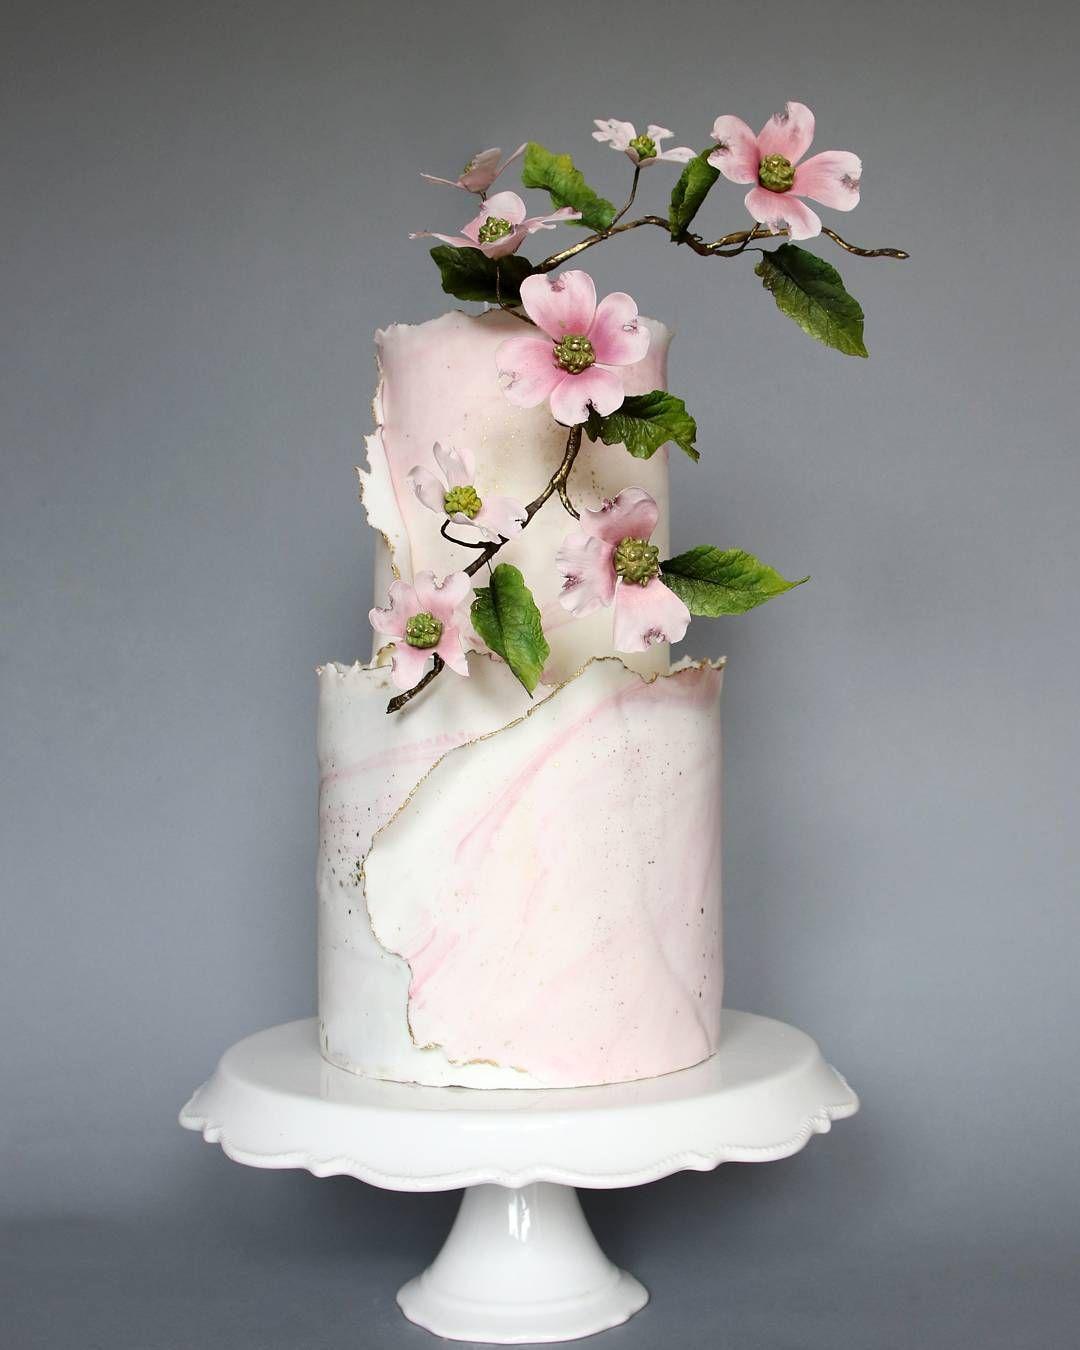 22 Beautiful wedding cakes to inspire you : Subtle marble pink wedding cake